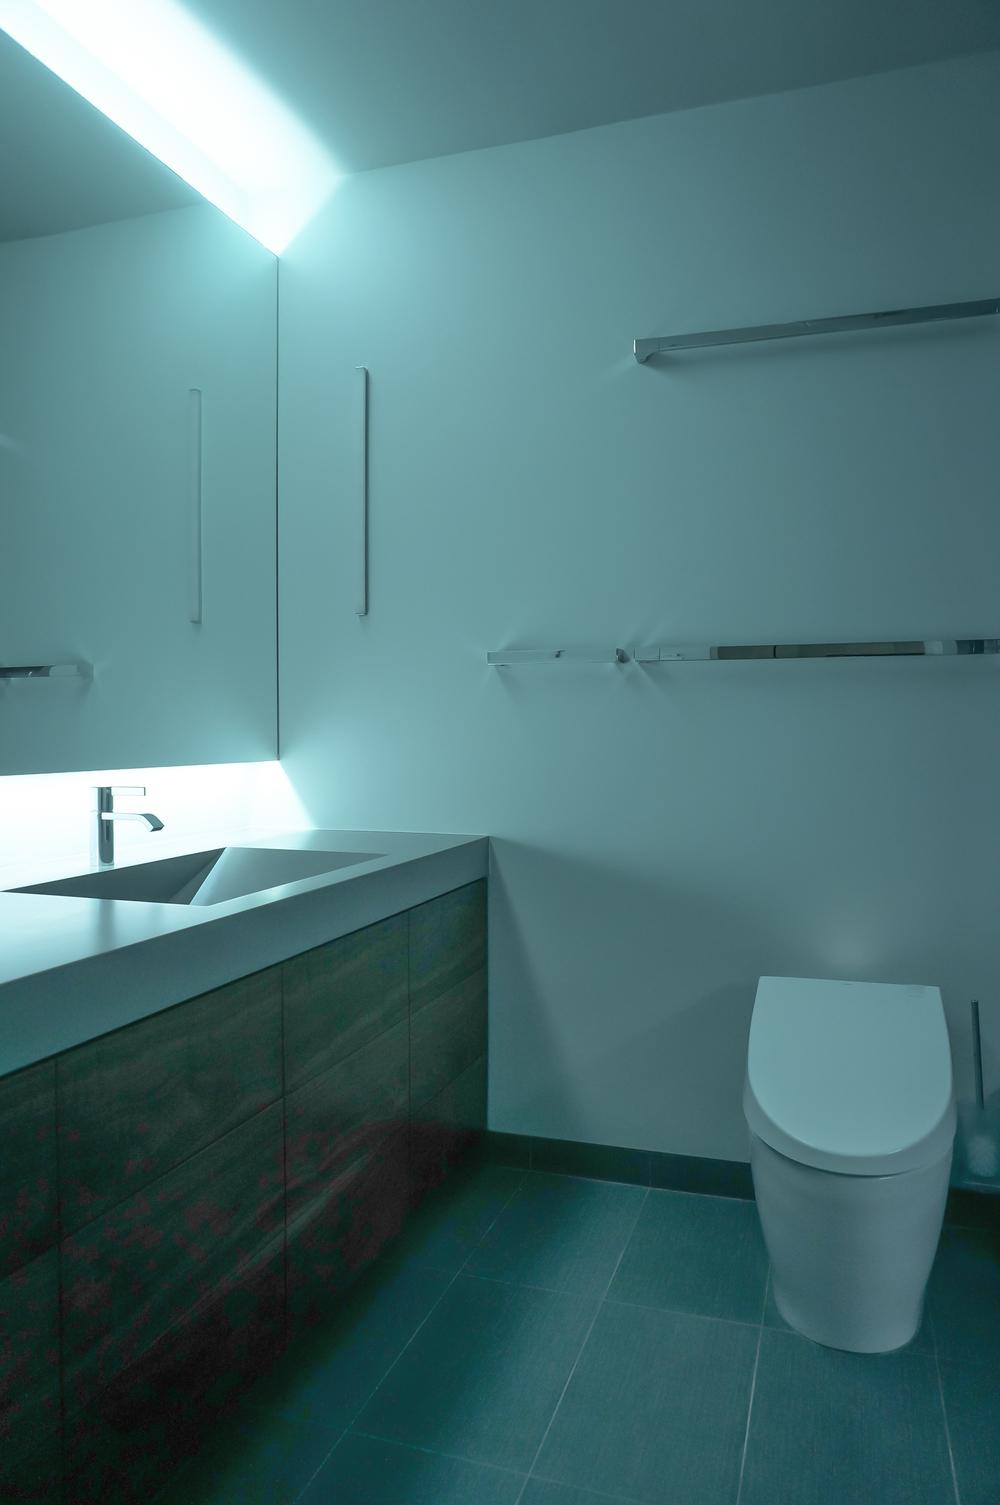 Janel Holiday Interior Design penthouse Master Bathroom2.jpg